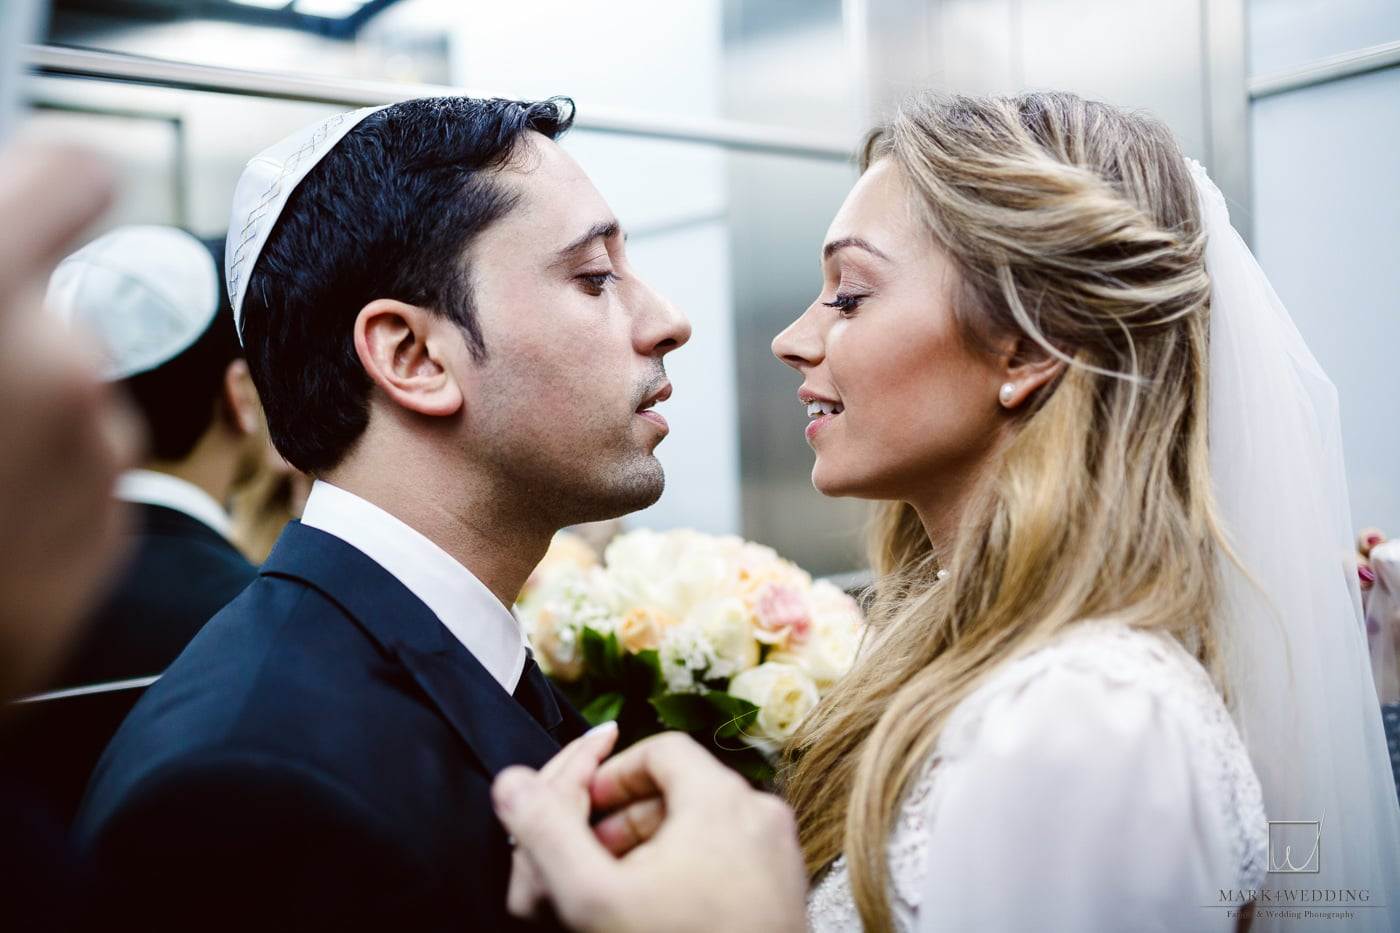 Galina & Assaf wedding_270.jpg